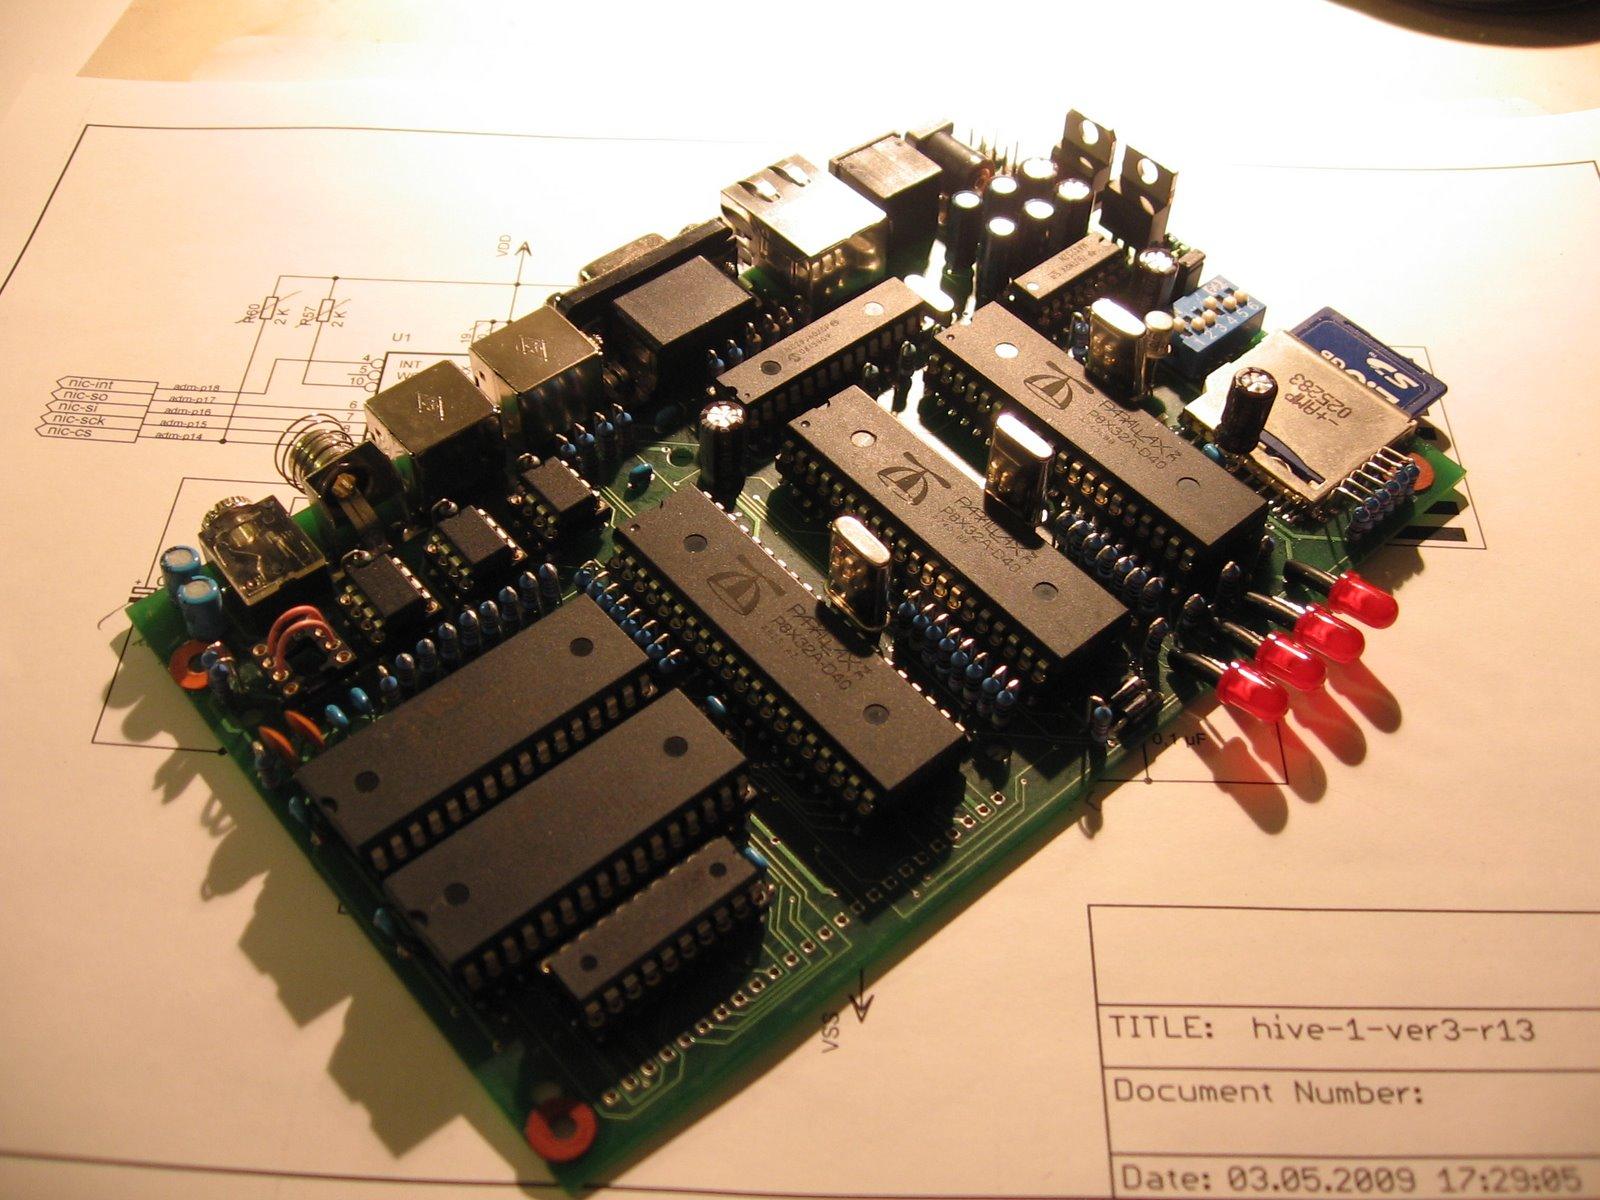 Zugriffsstatistik Fr March 2015 Referrer 220 Outlet Wiring Diagram Http 220outletcom Electricalpanelphp